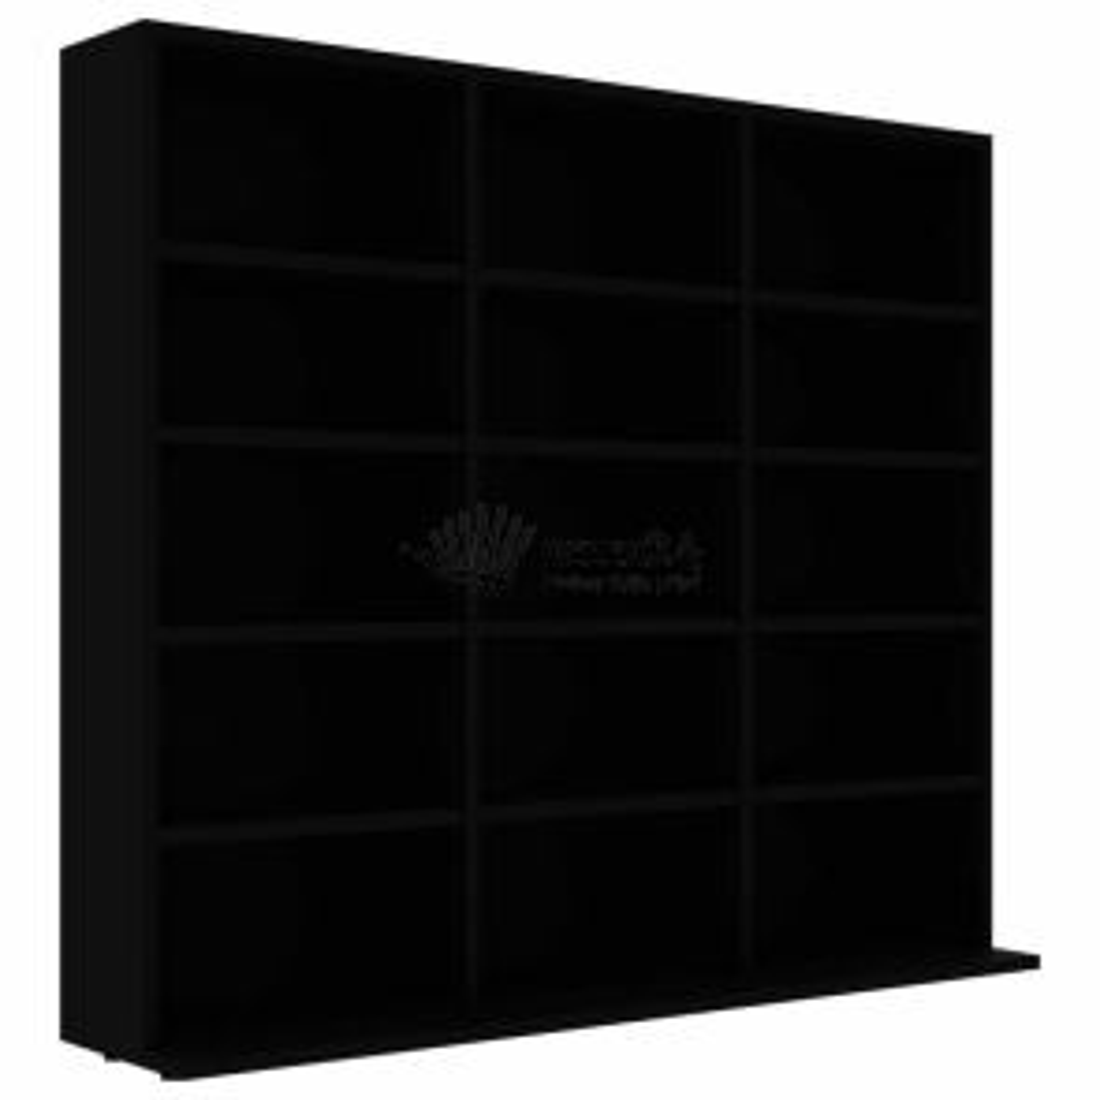 vidaXL Skříňka na CD černá 102 x 23 x 89,5 cm dřevotříska [801788]